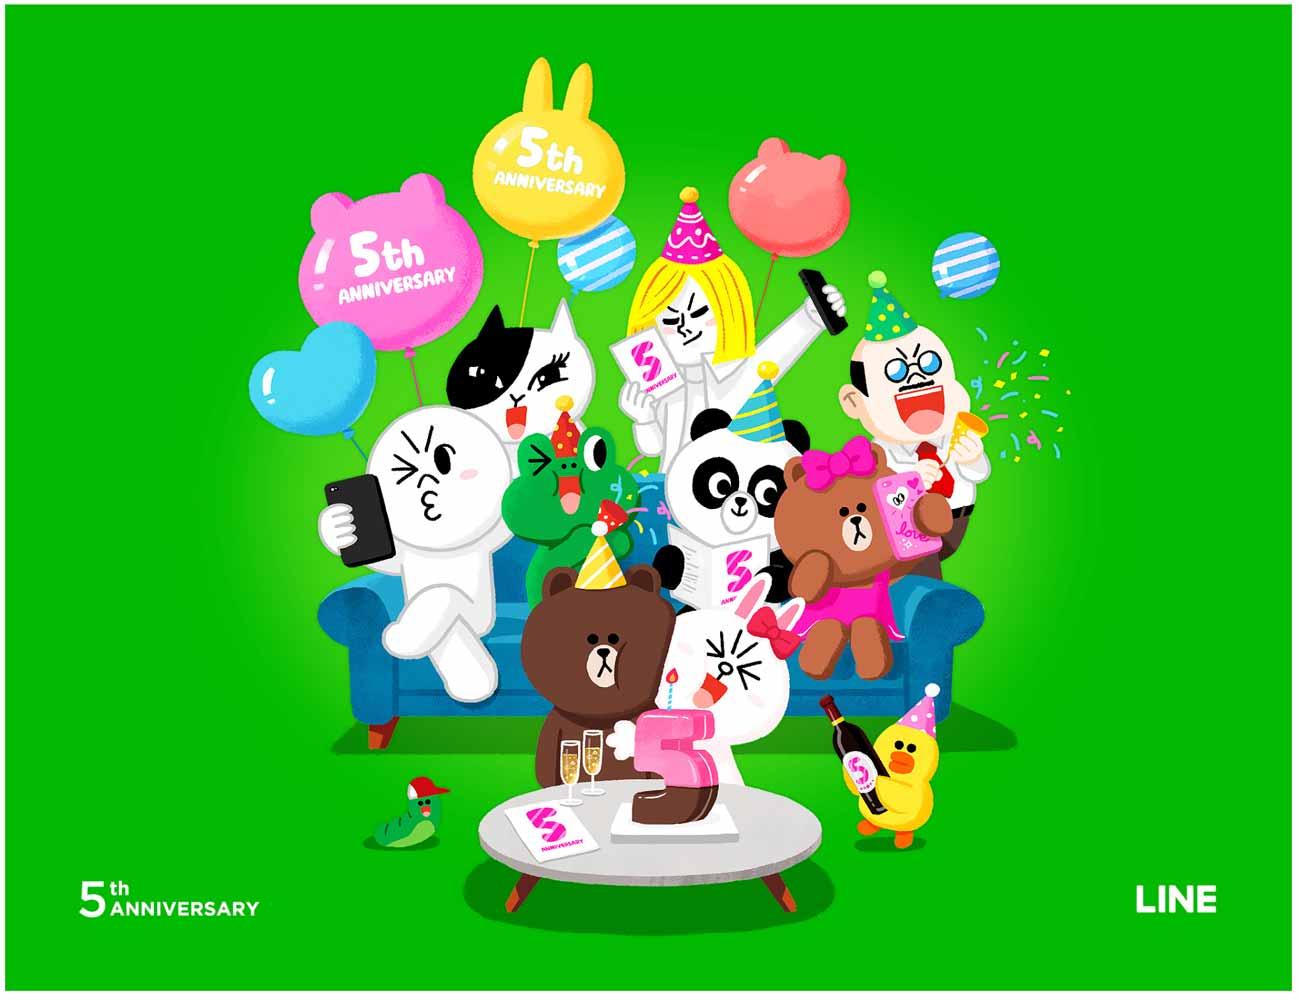 LINE、サービス開始5周年を記念して「LINEキャラクタースタンプ」50%オフなど1日限定キャンペーンを開催へ